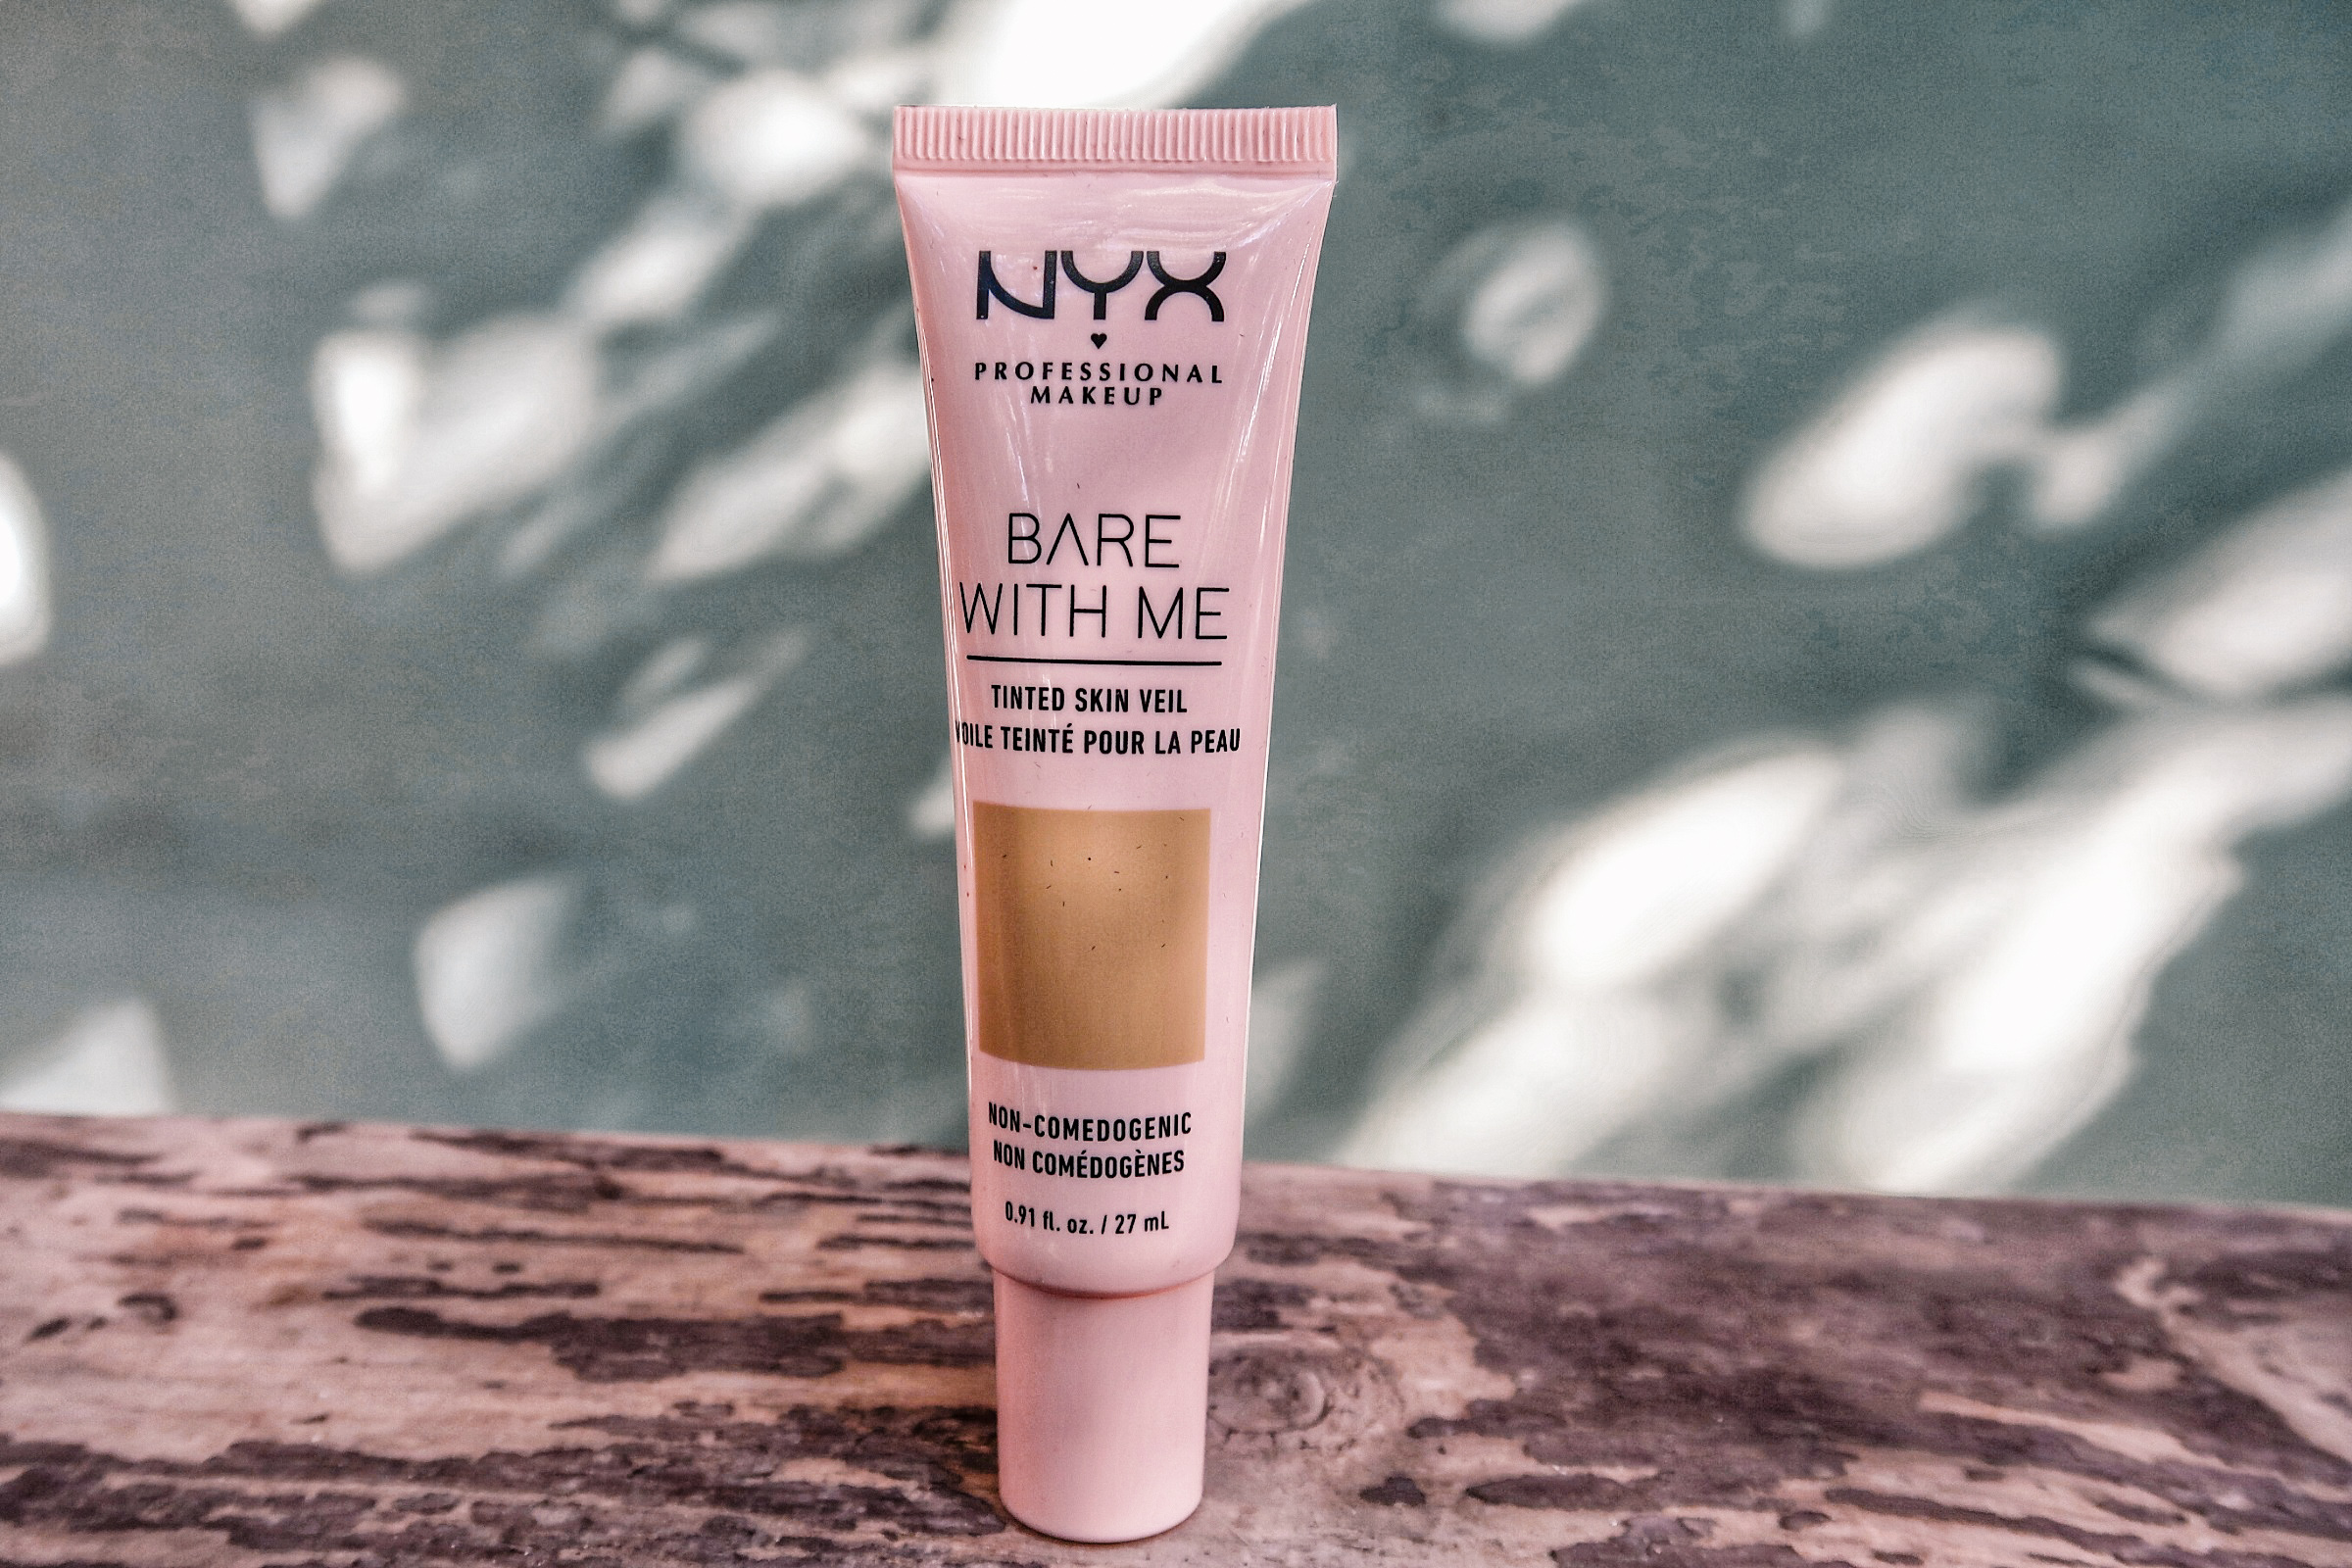 #orecomandare Nyx Bare with me skin veil